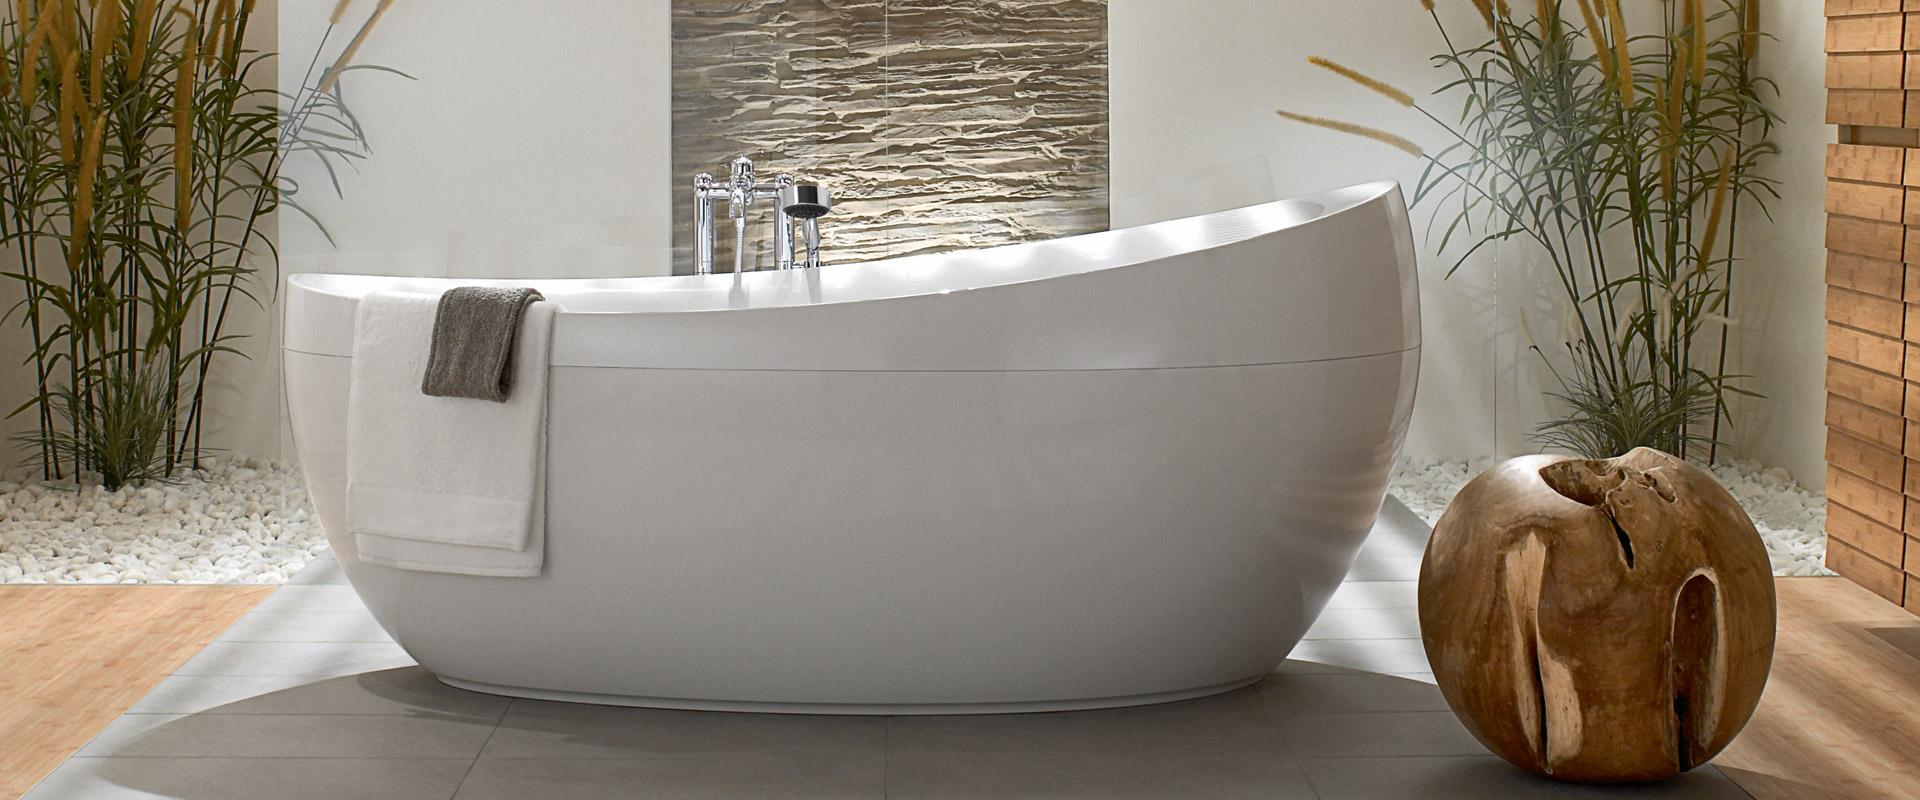 Vasche da bagno villeroy boch a padova e vicenza - Vasche da bagno ovali ...